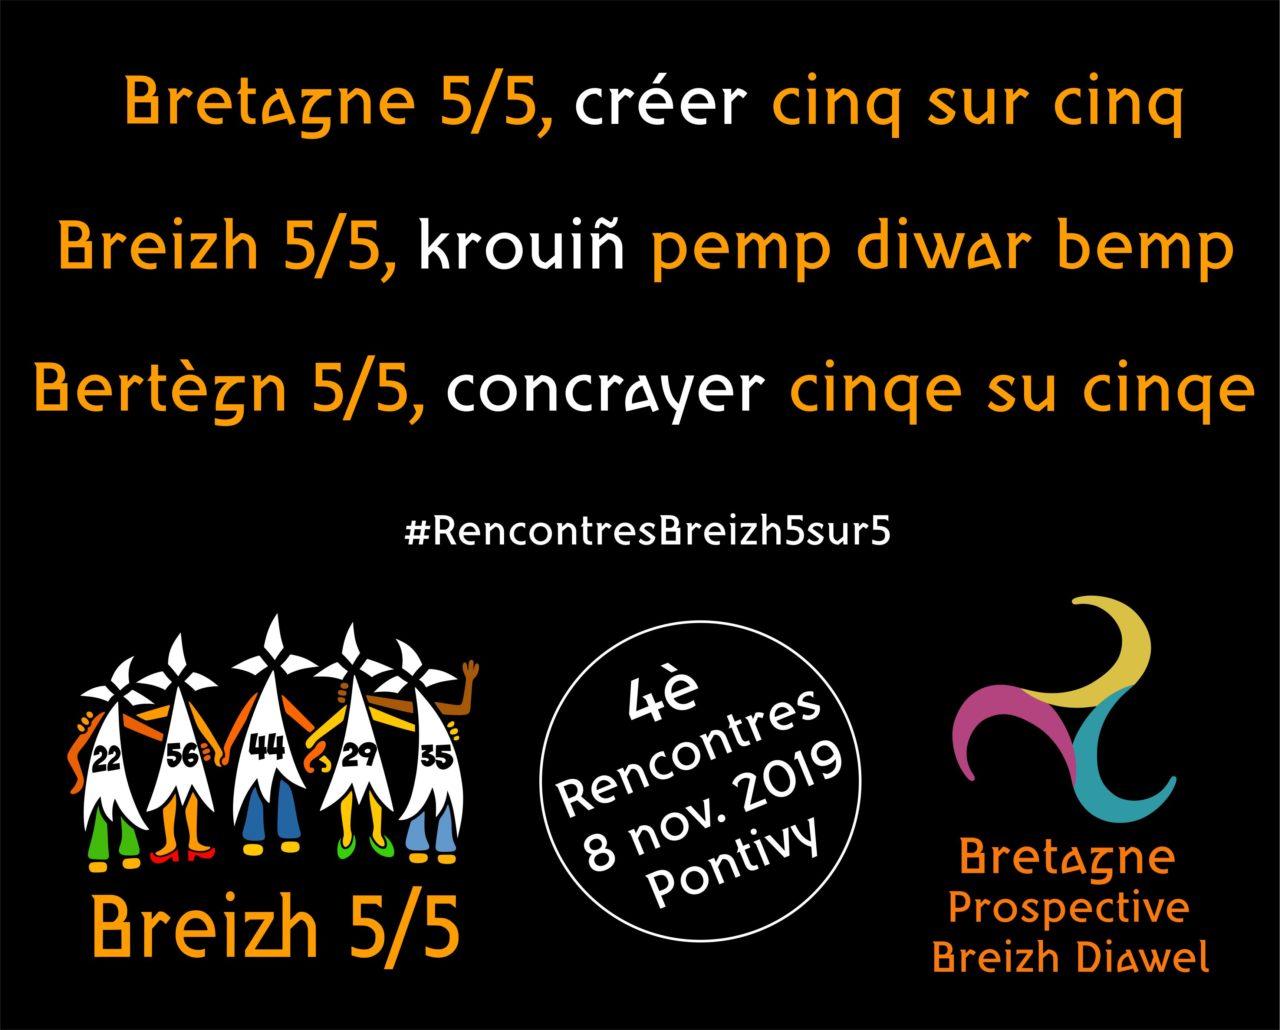 Les rencontres Breizh 5/5 de Pontivy